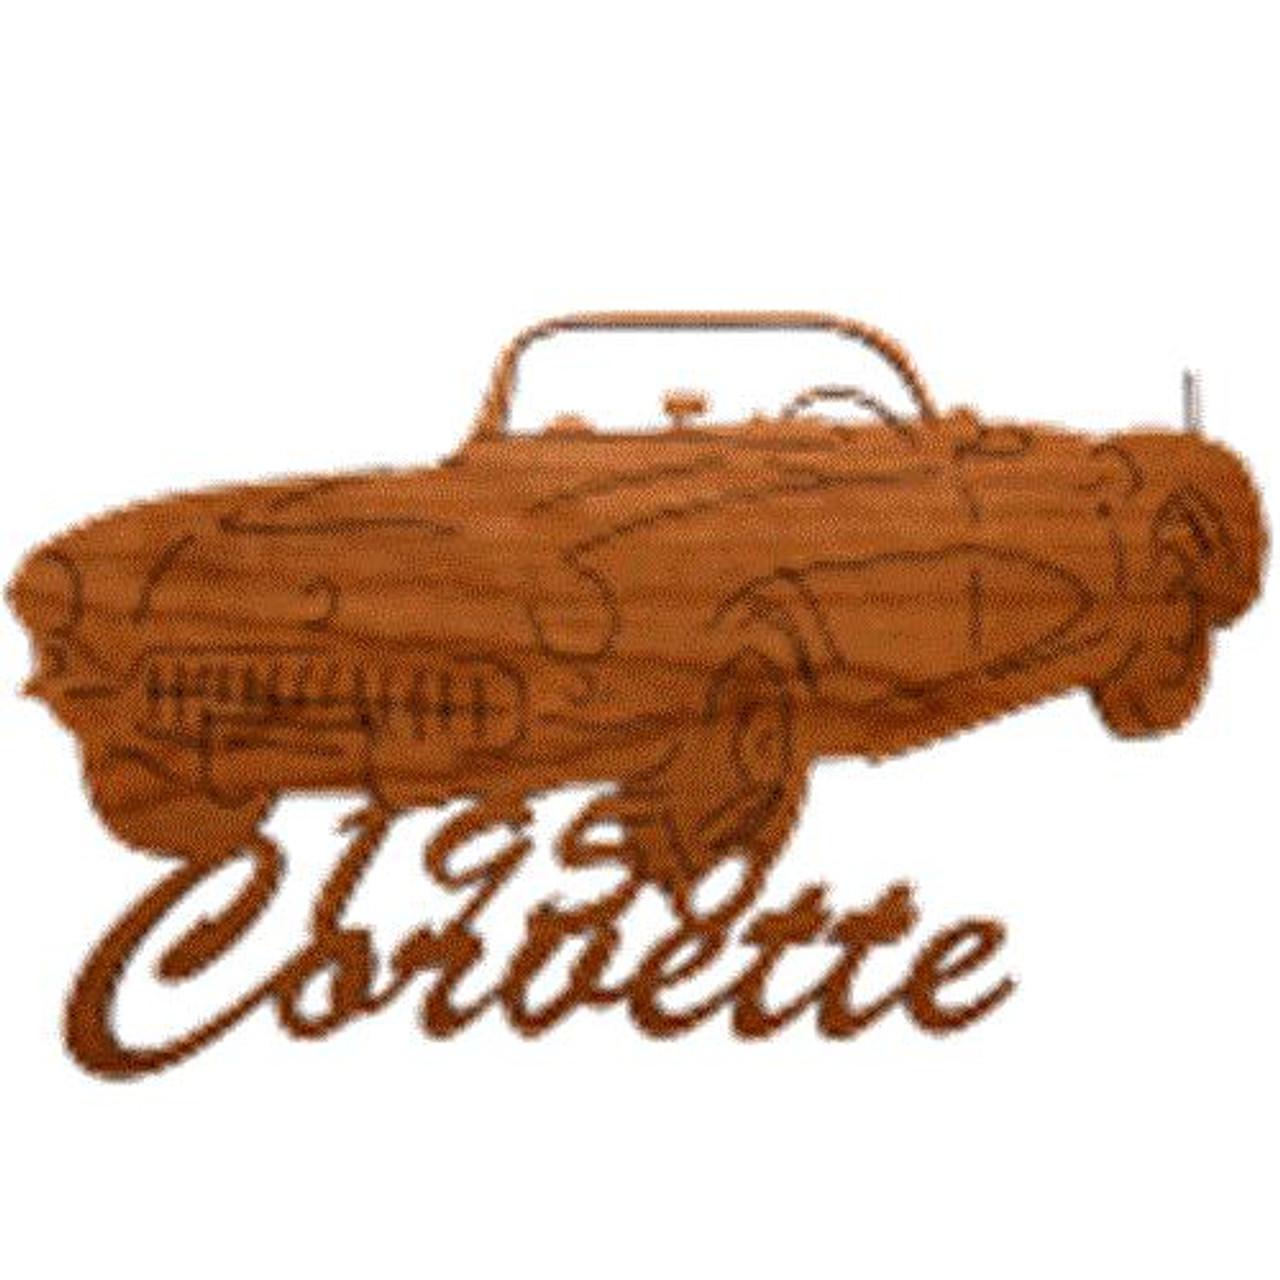 Wildwood Designs 1956 Corvette Muscle Car Plan